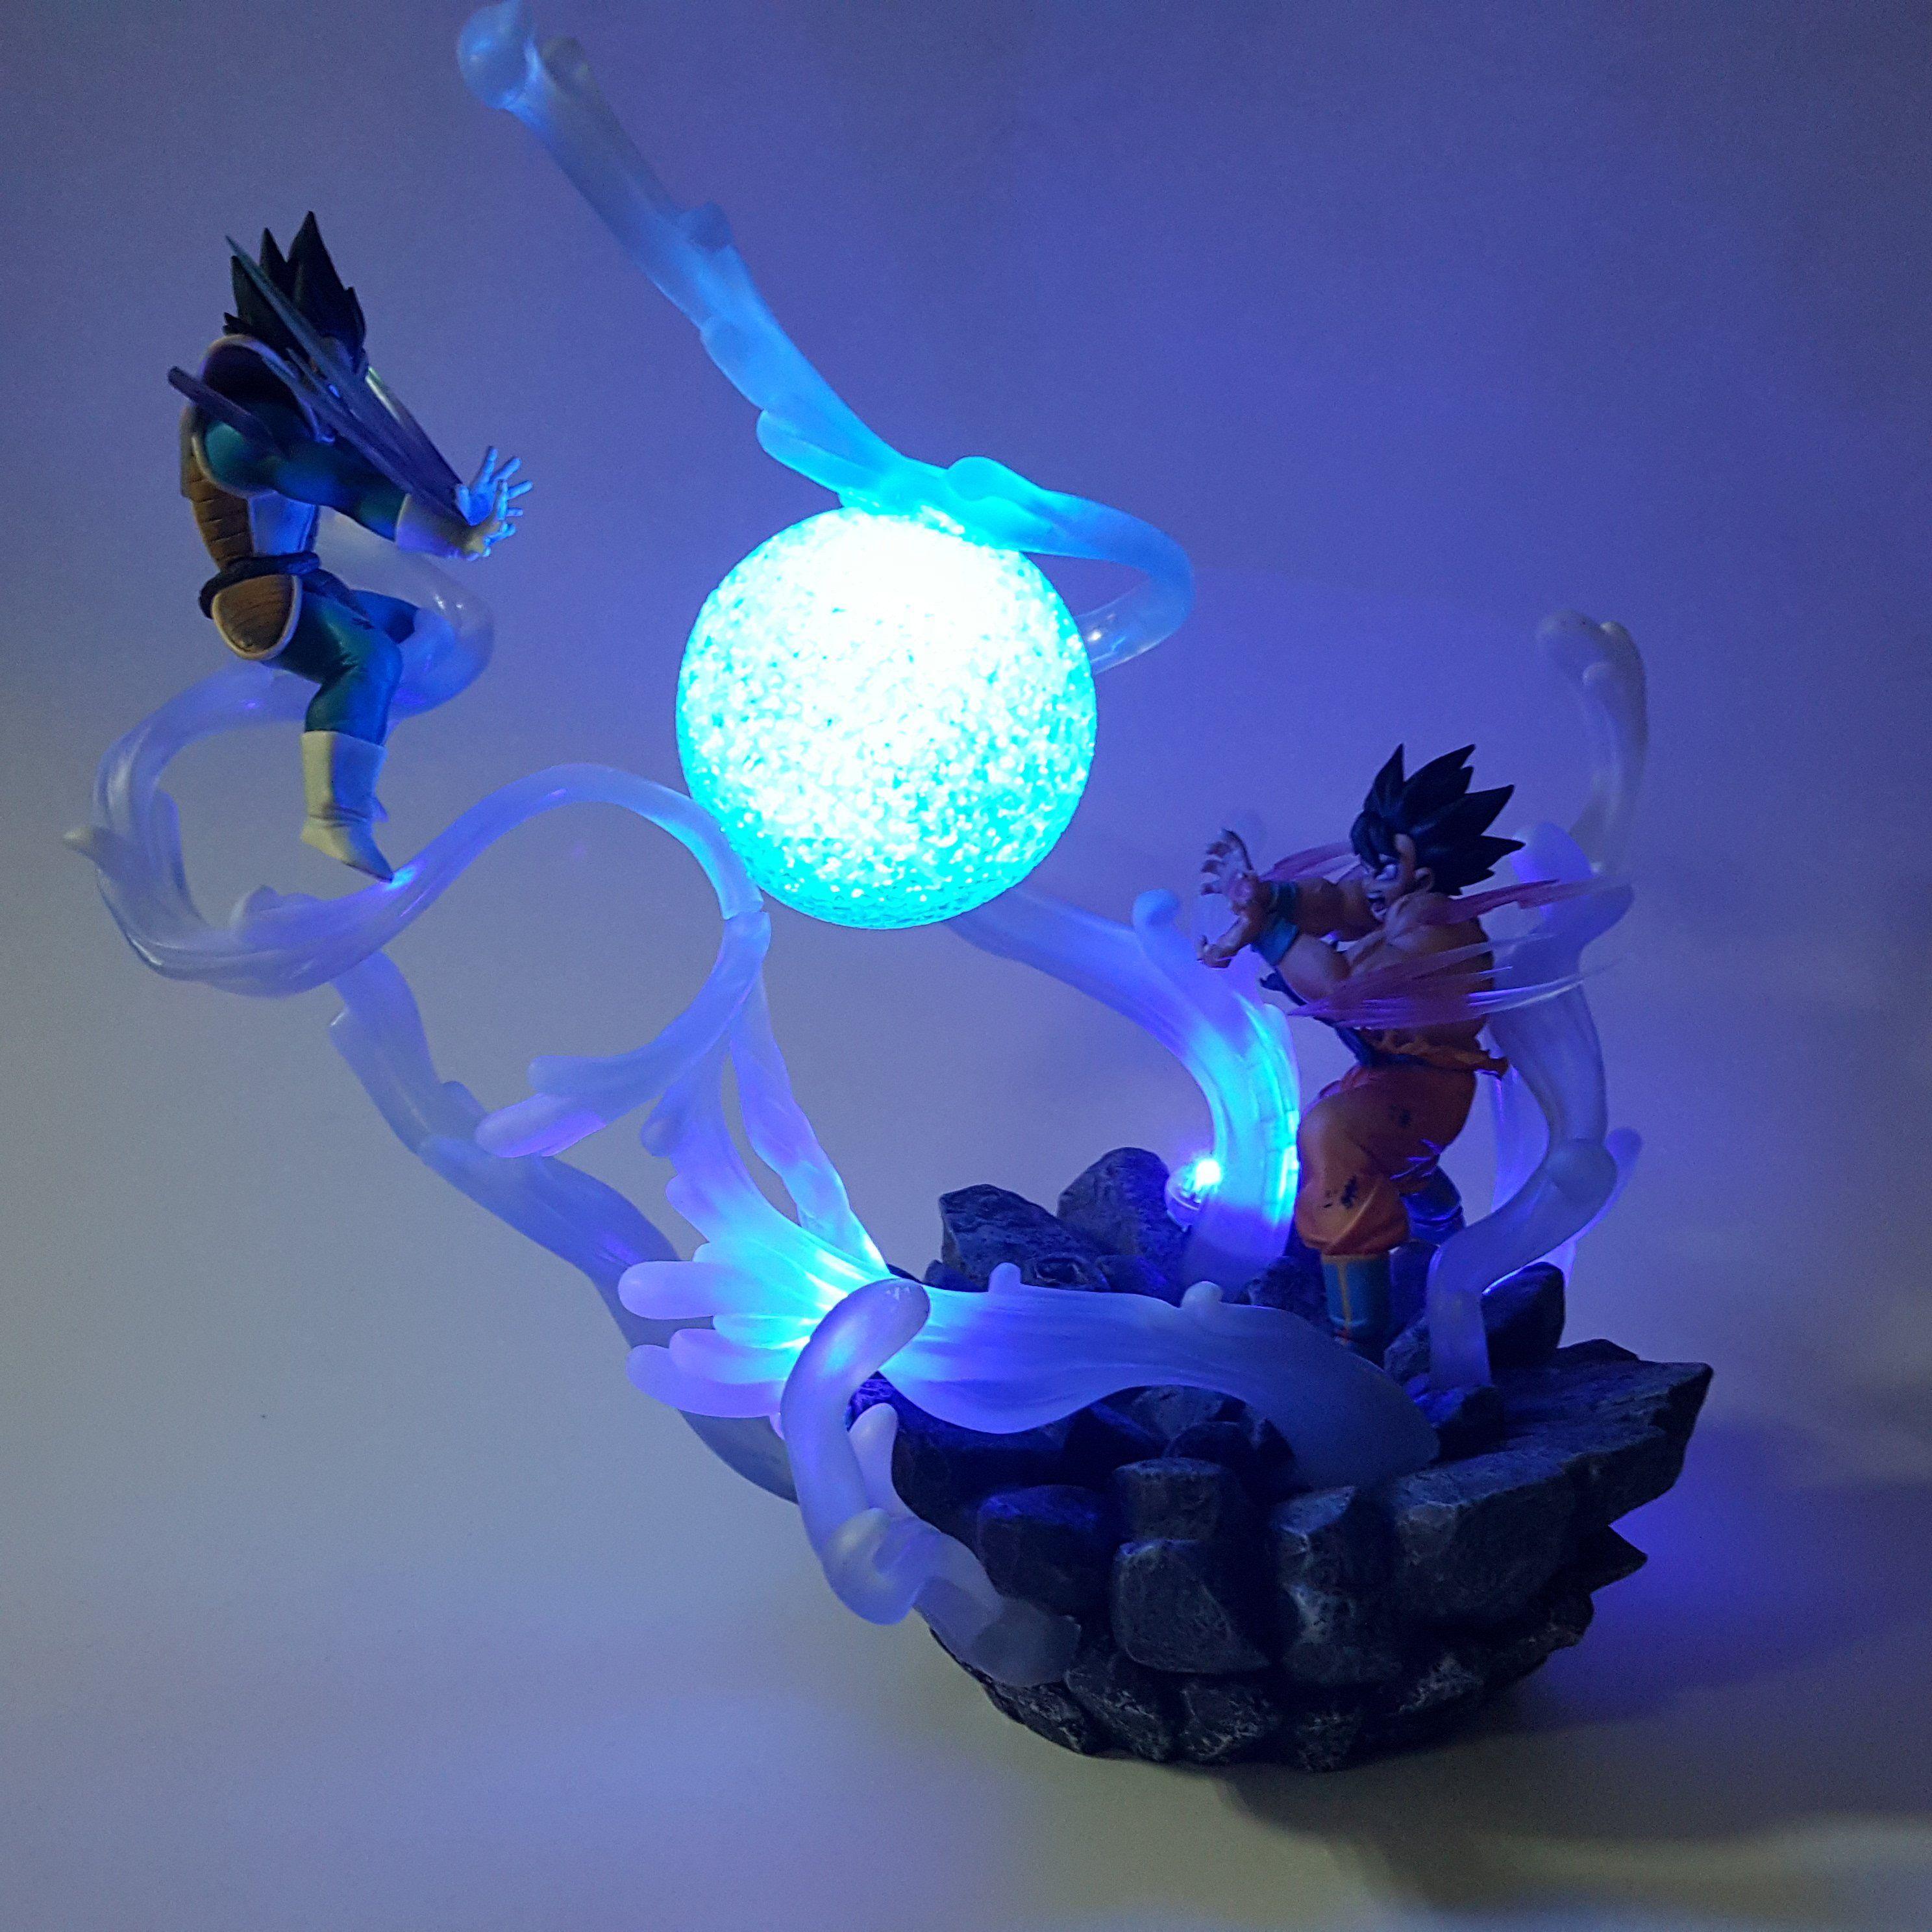 Dragon Ball Son Goku 3D LED Crystal Decor Night Light Table Desk Lamp Best Gif